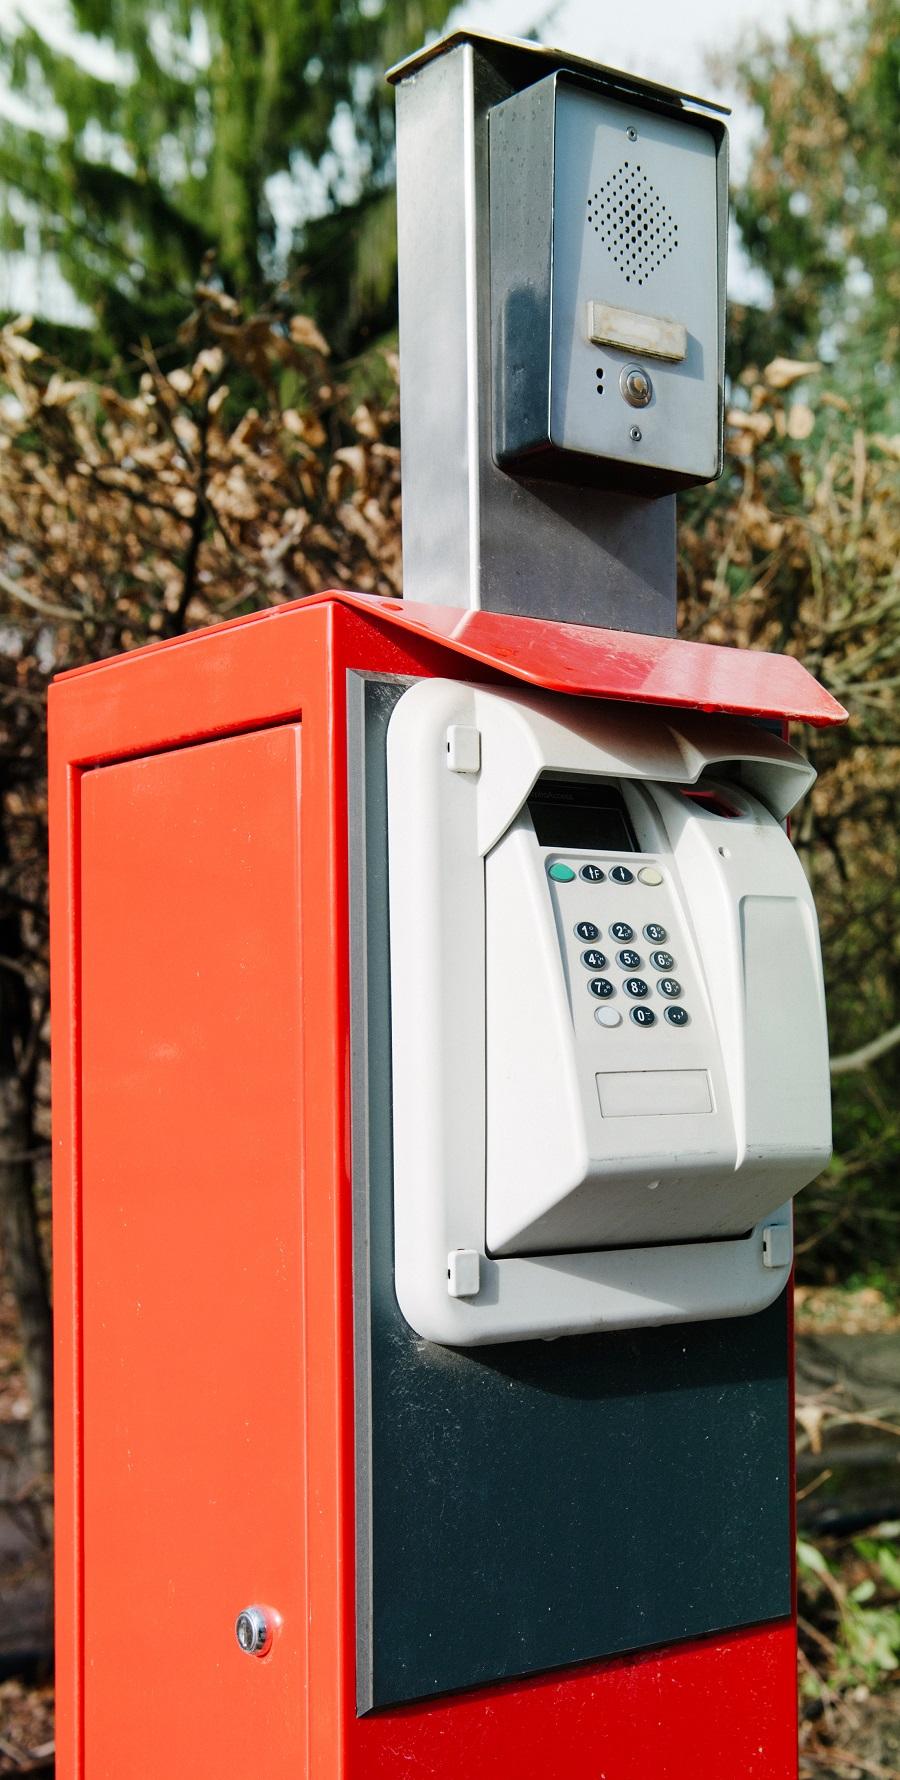 Porteros automaticos precios free telefono portero auta - Telefono portero automatico ...